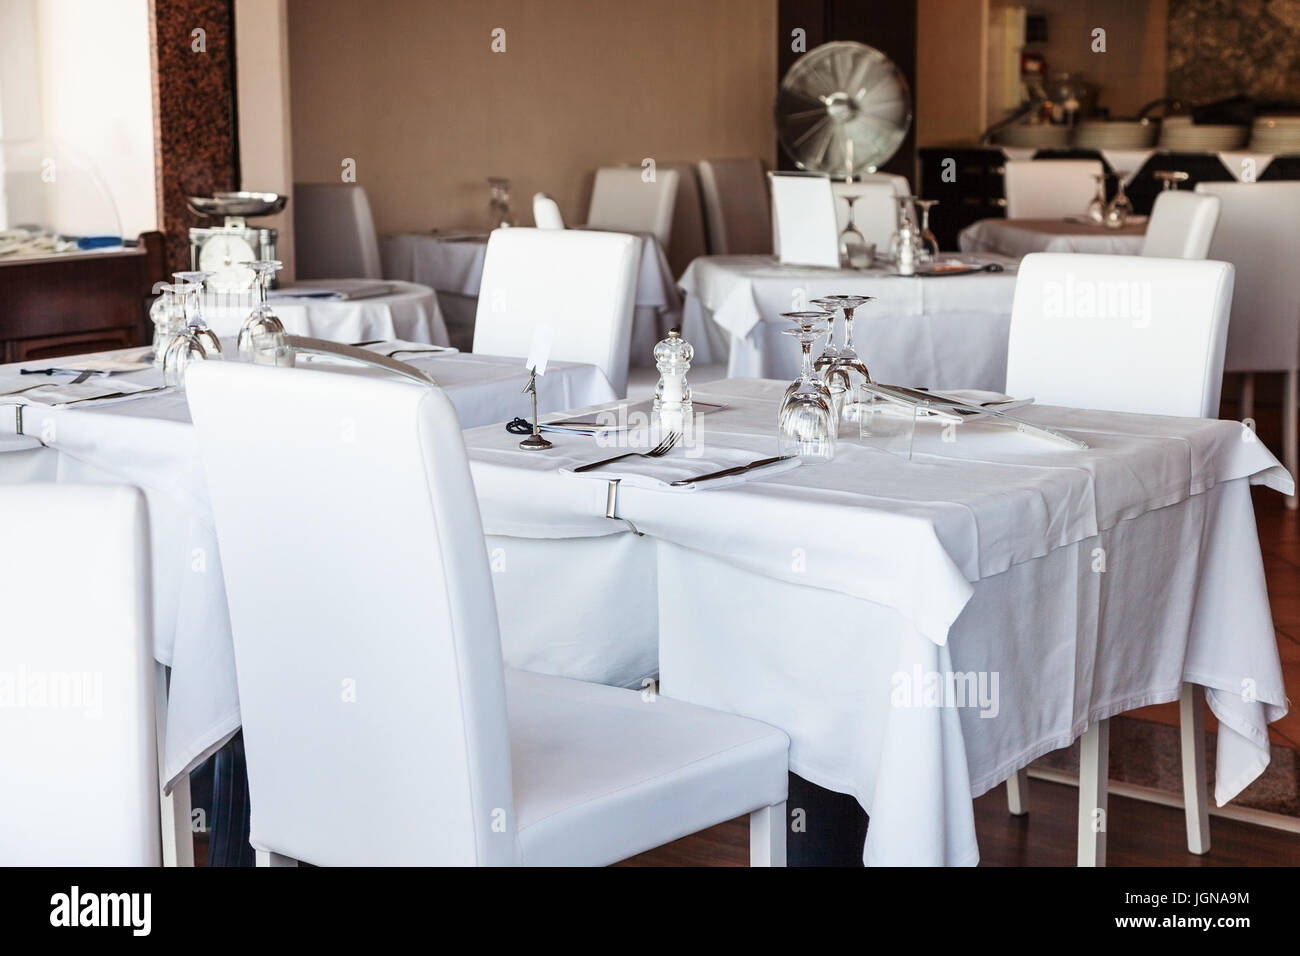 Sedie di pelle bianca e tavoli coperti da tovaglie bianche nel ...